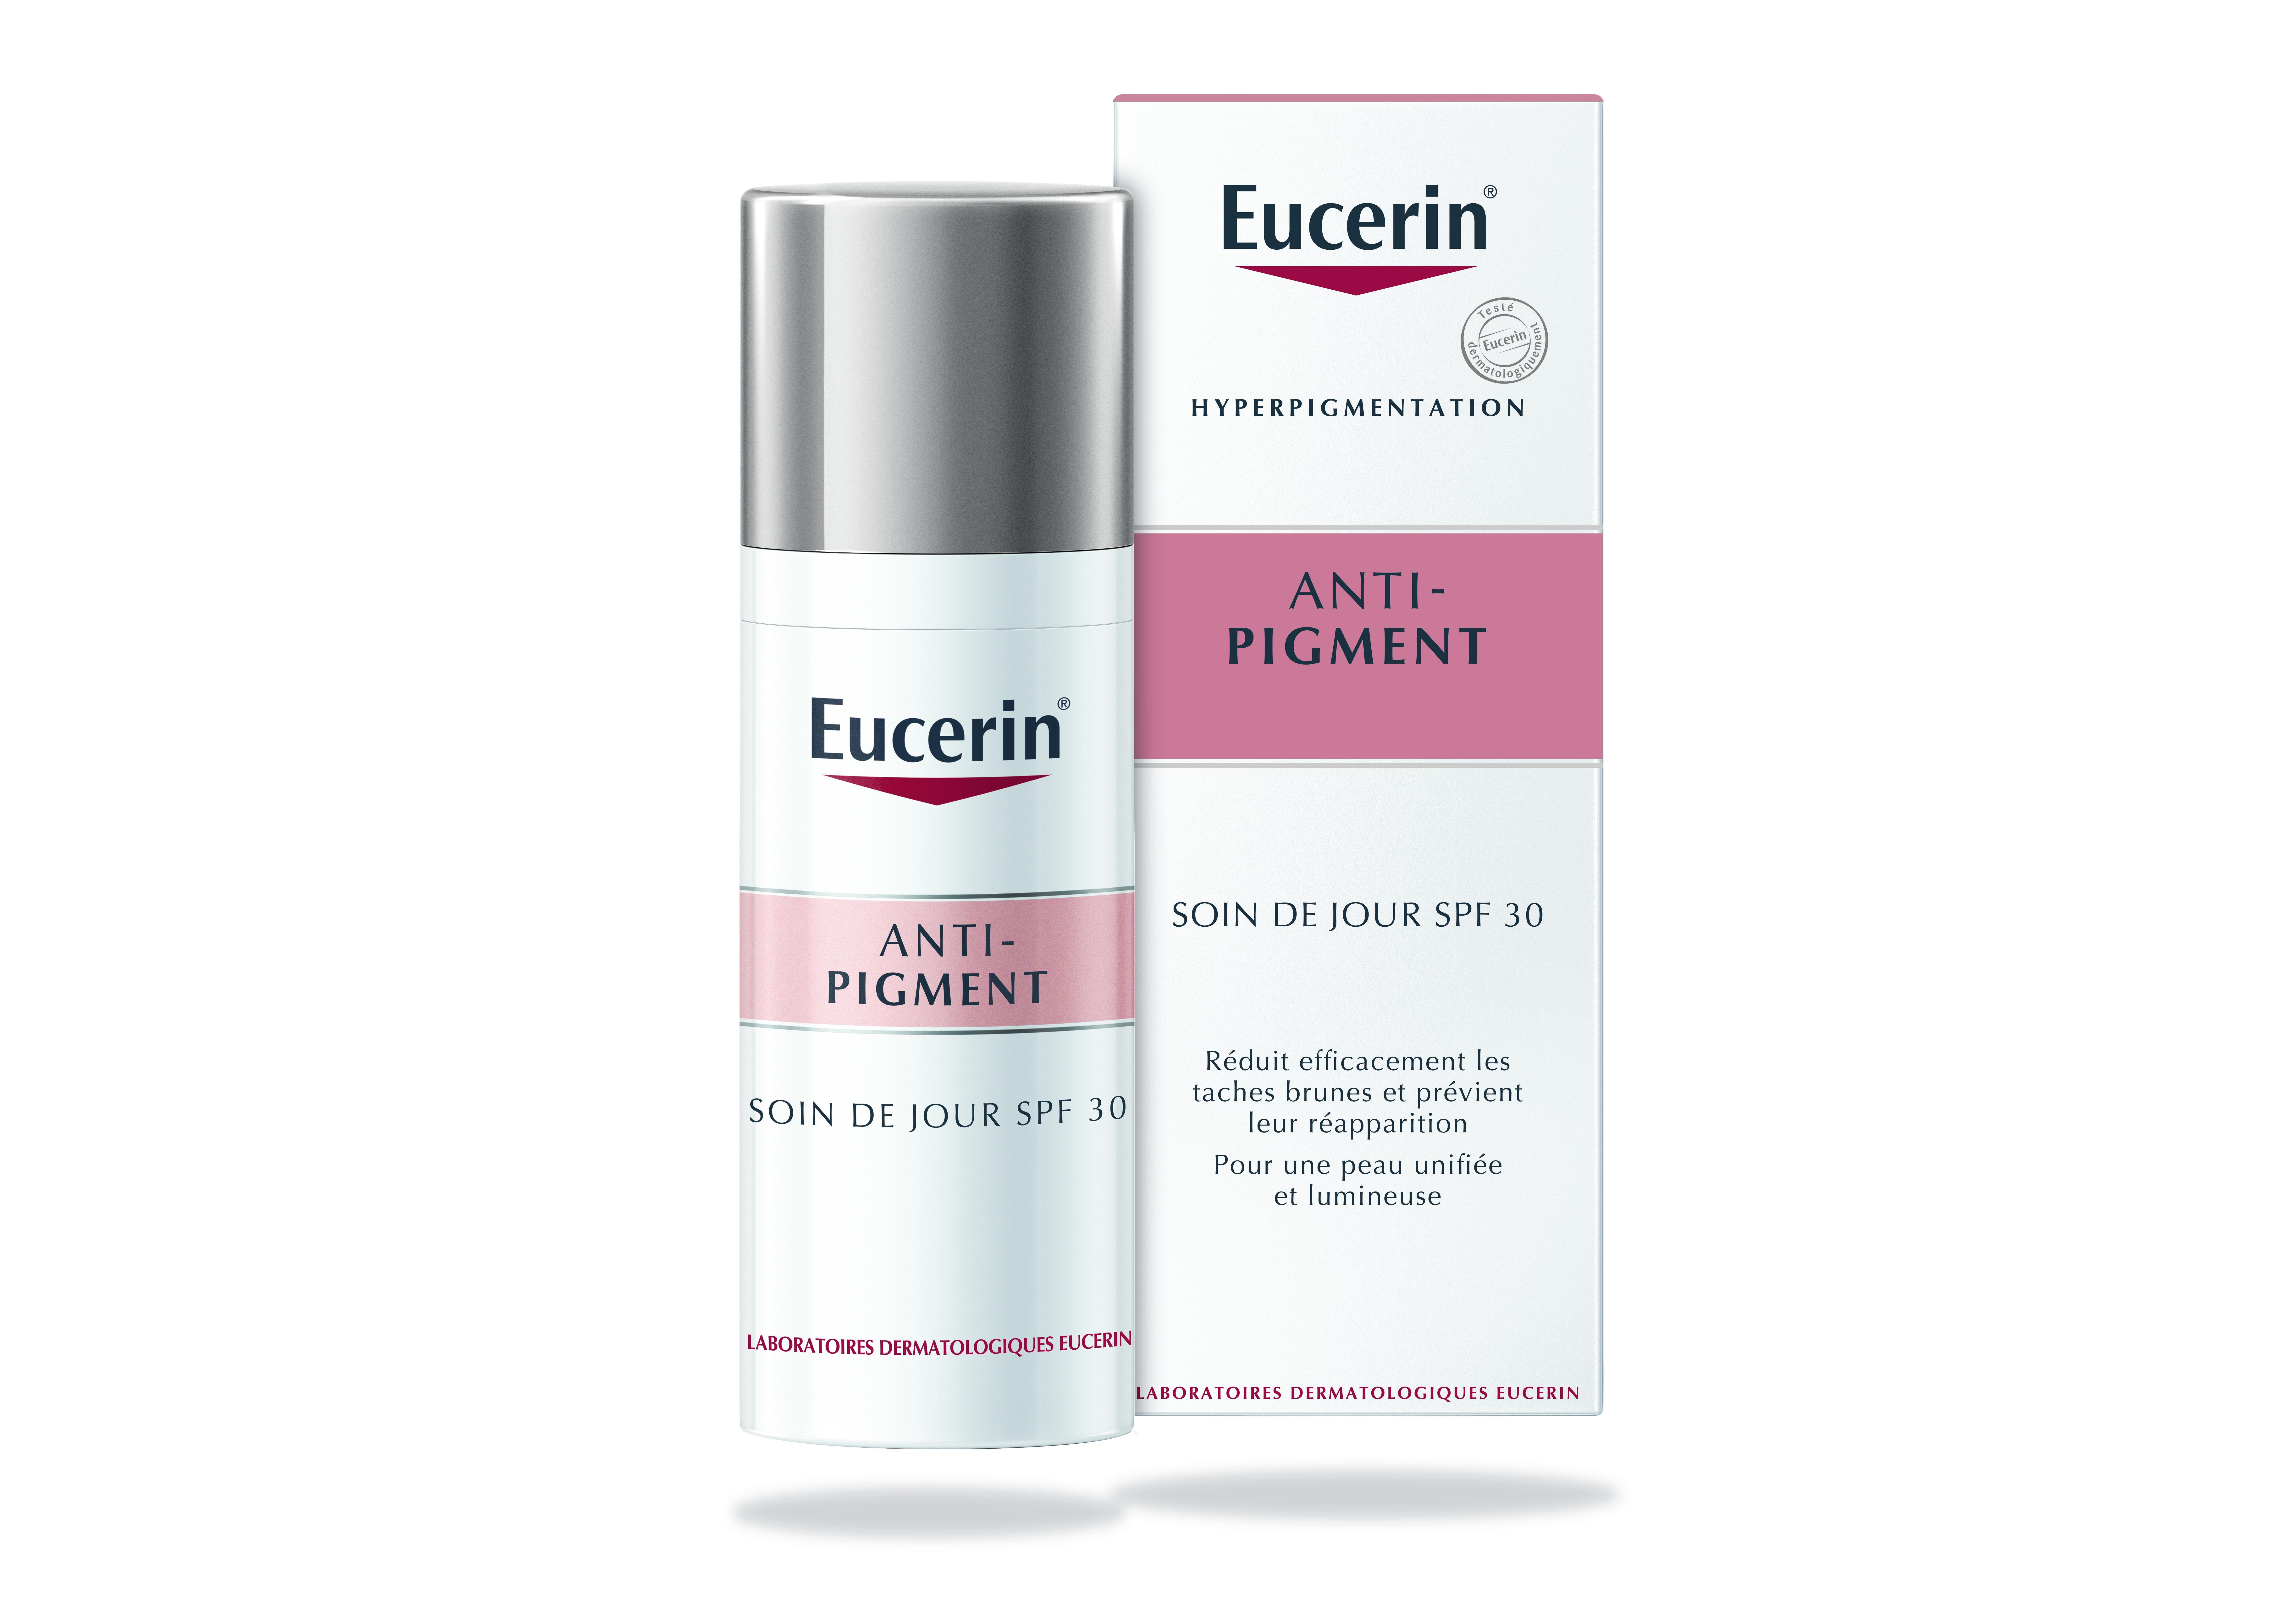 Anti Pigment Crème Eucerin